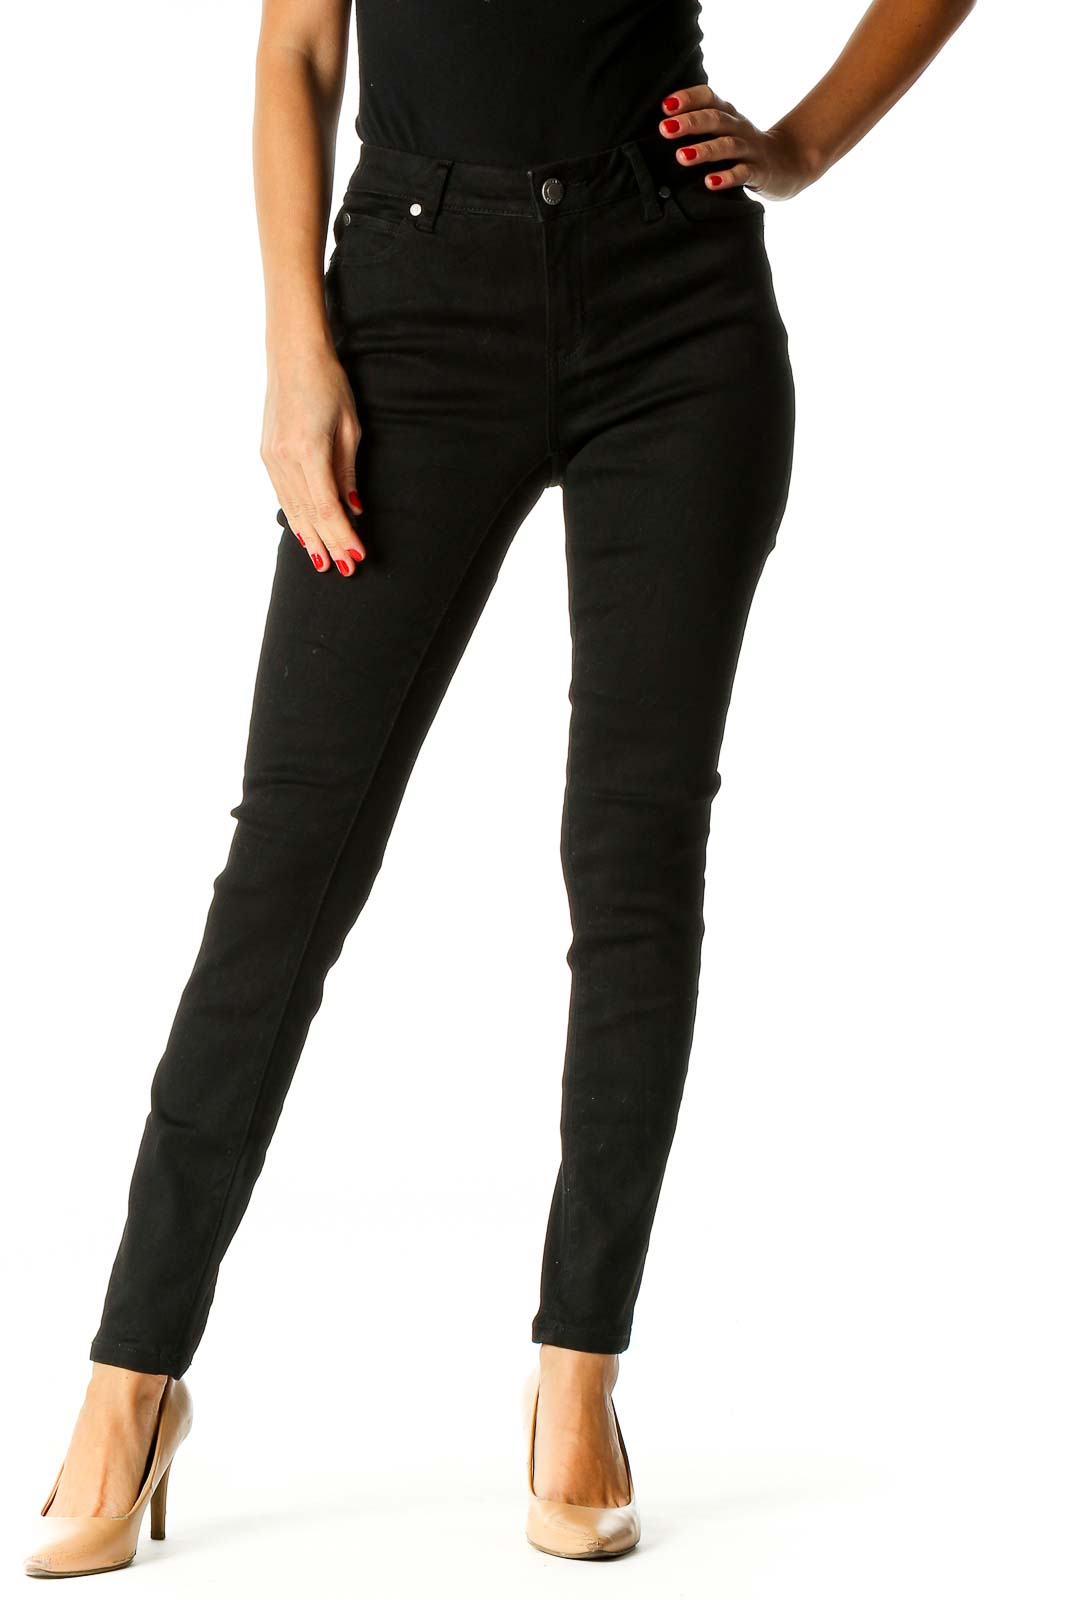 Black Skinny Jeans Front